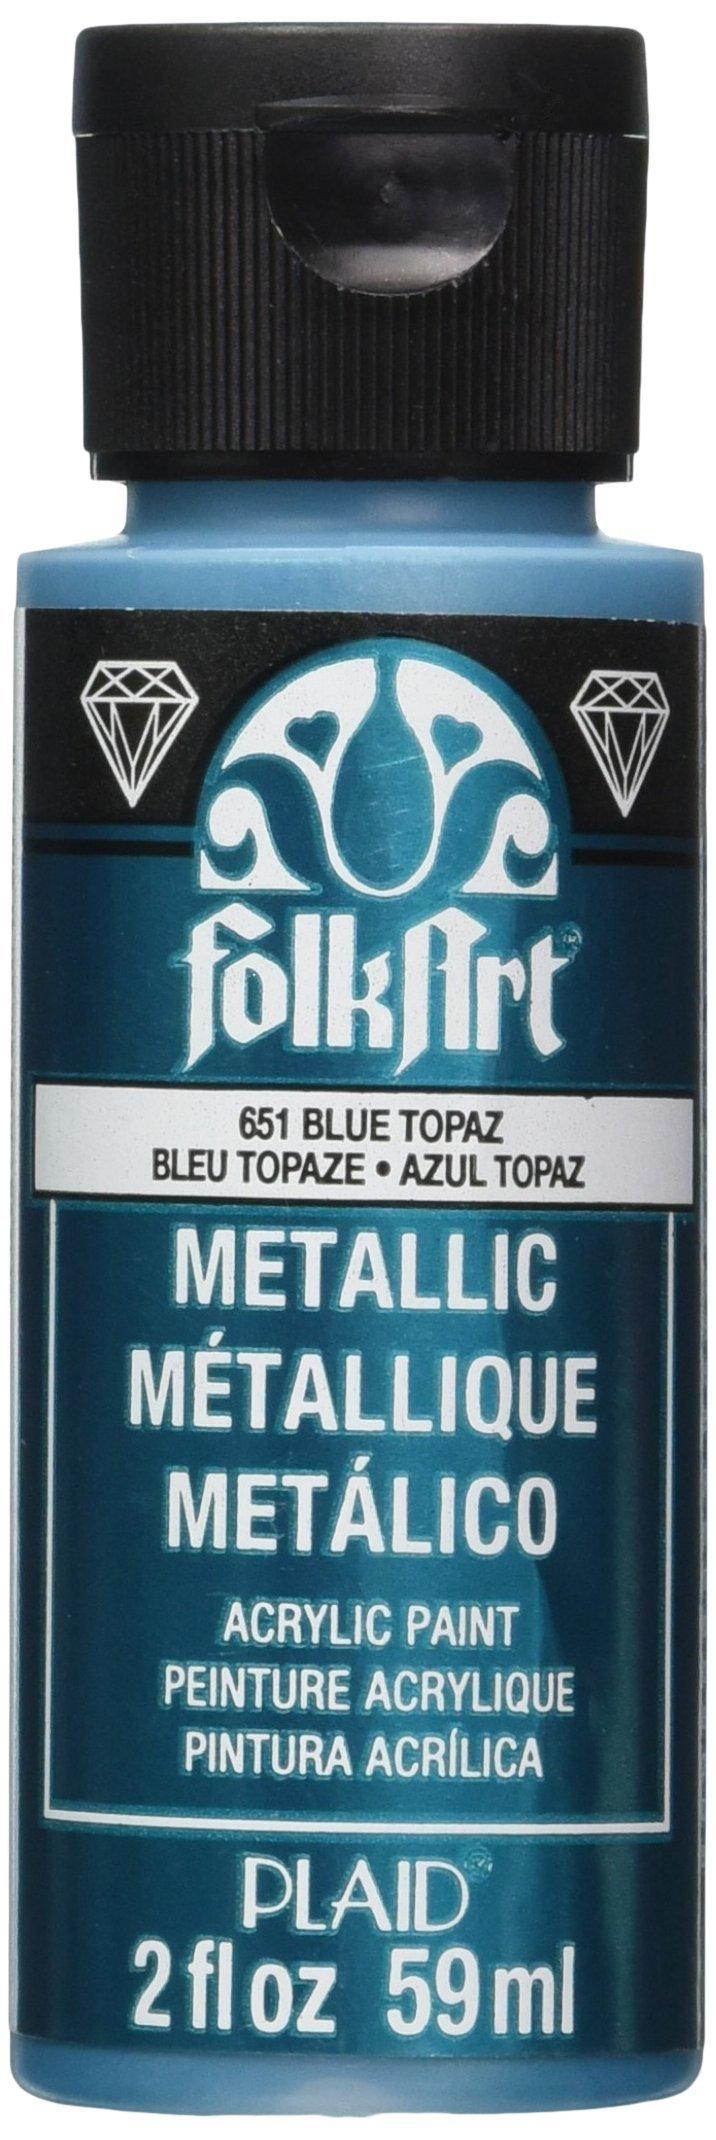 FolkArt Metallic Acrylic Paint in Assorted Colors (2 oz), 651, Blue Topaz